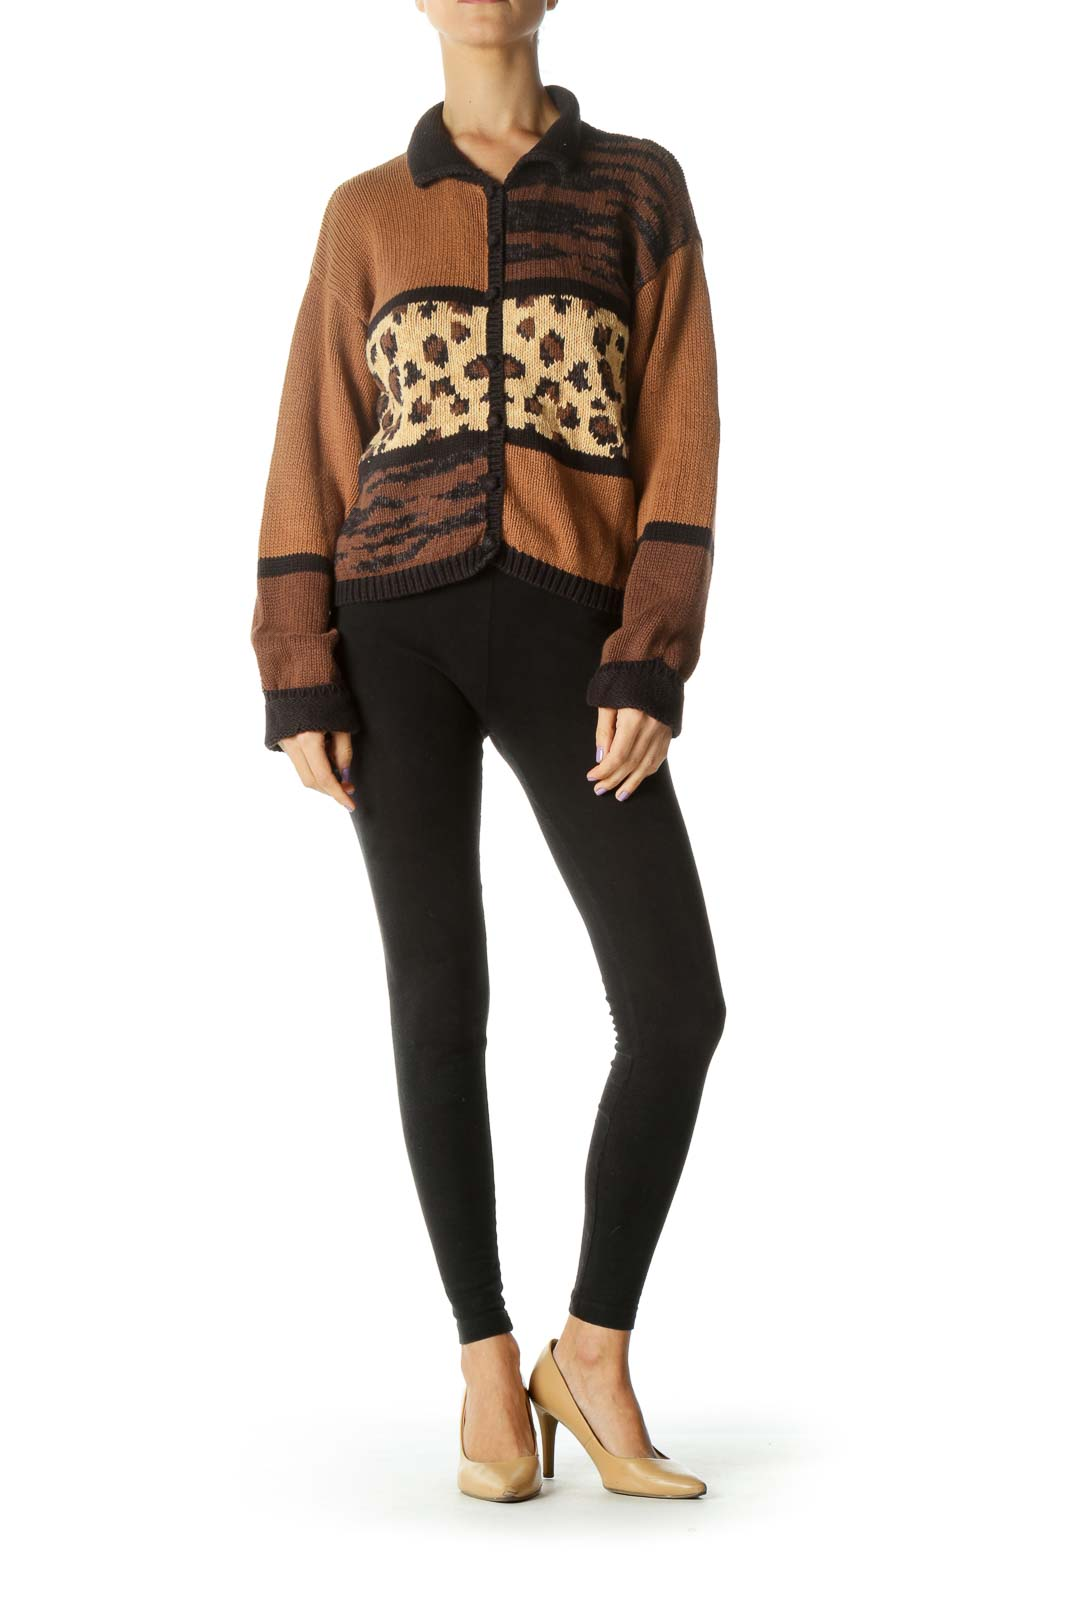 Brown Cheetah Print Knit Sweater